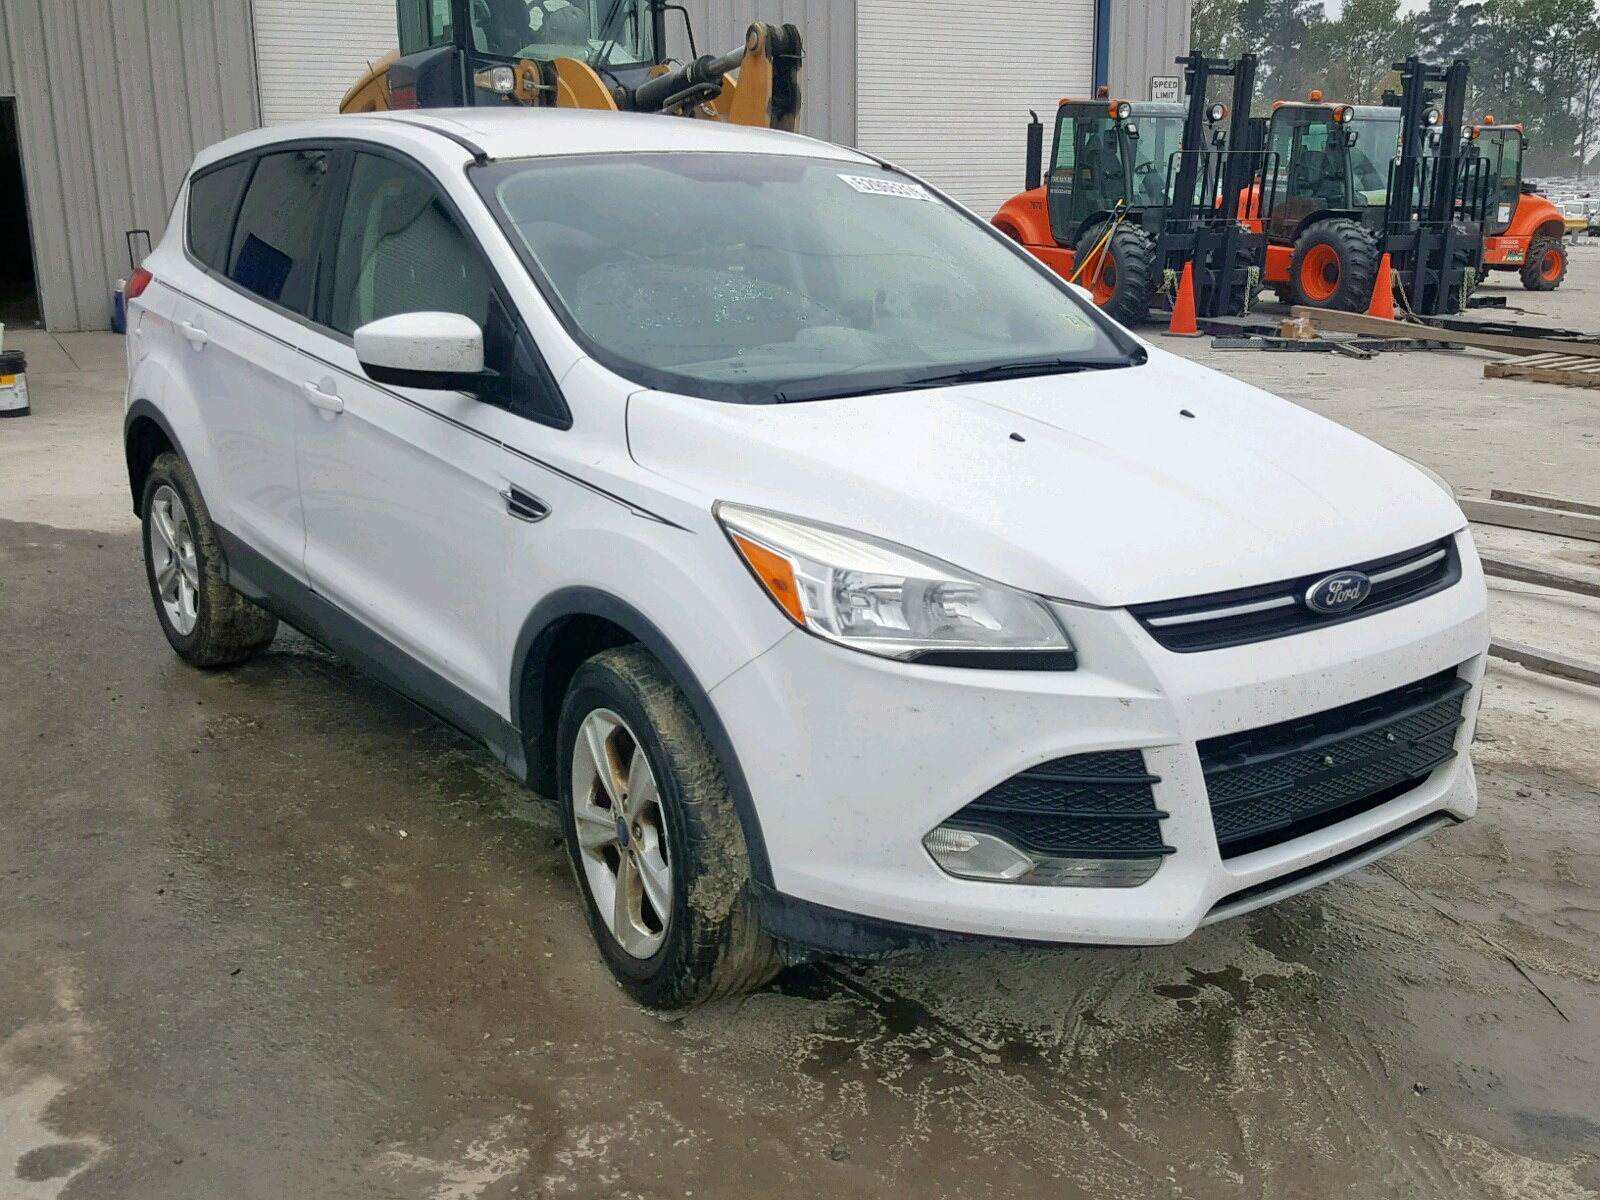 1FMCU9GX2DUD24425 - 2013 Ford Escape Se 1.6L Left View